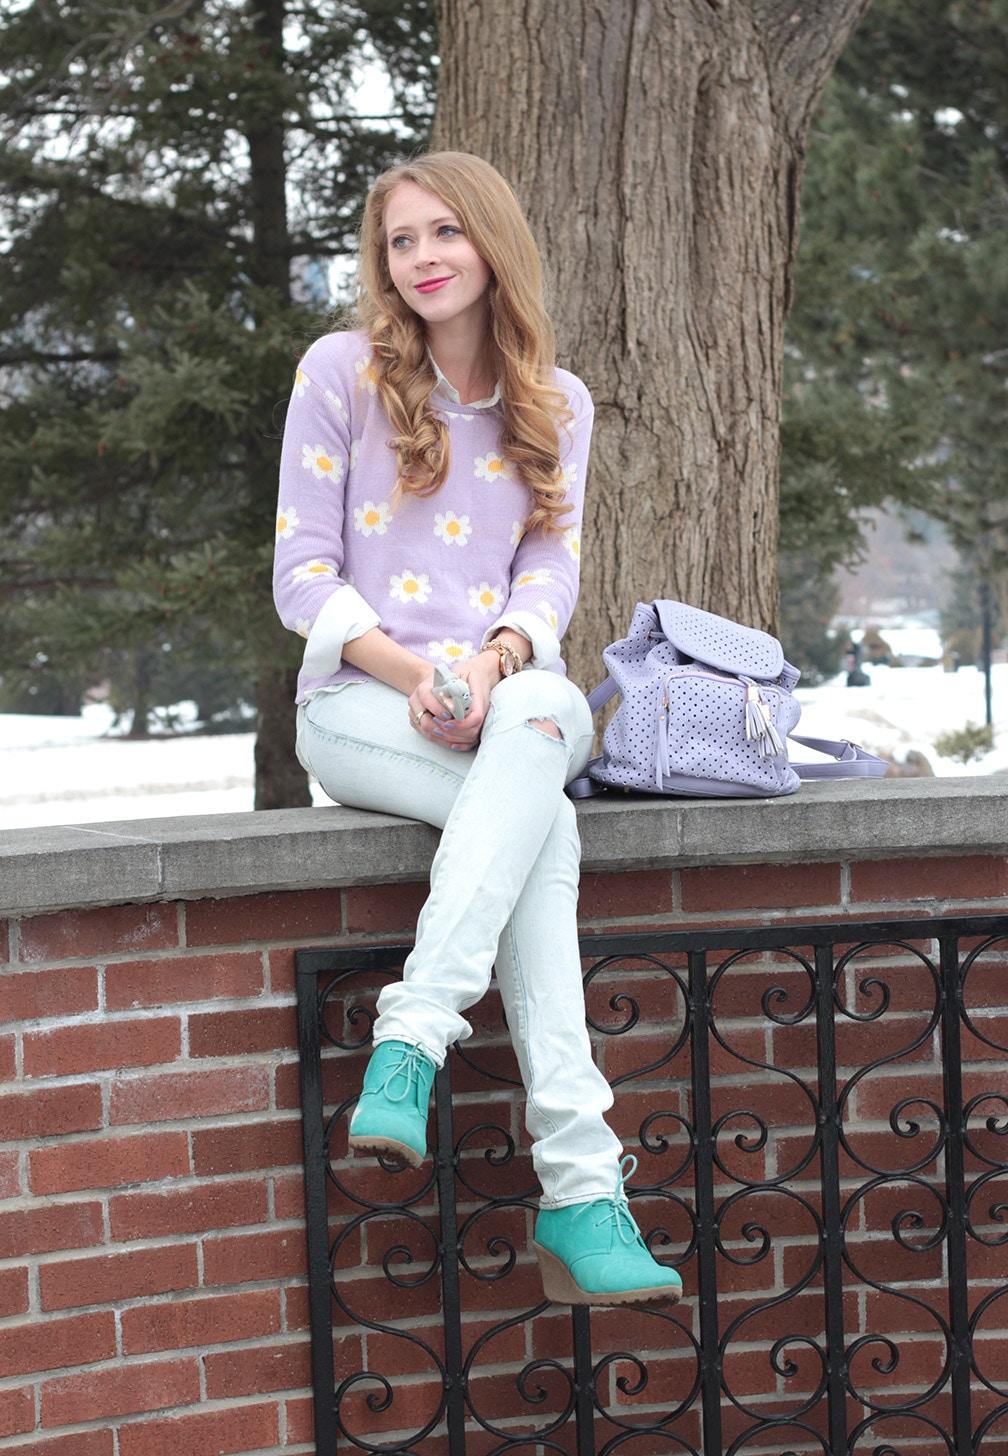 daisy knit sweater victoria beckham jeans